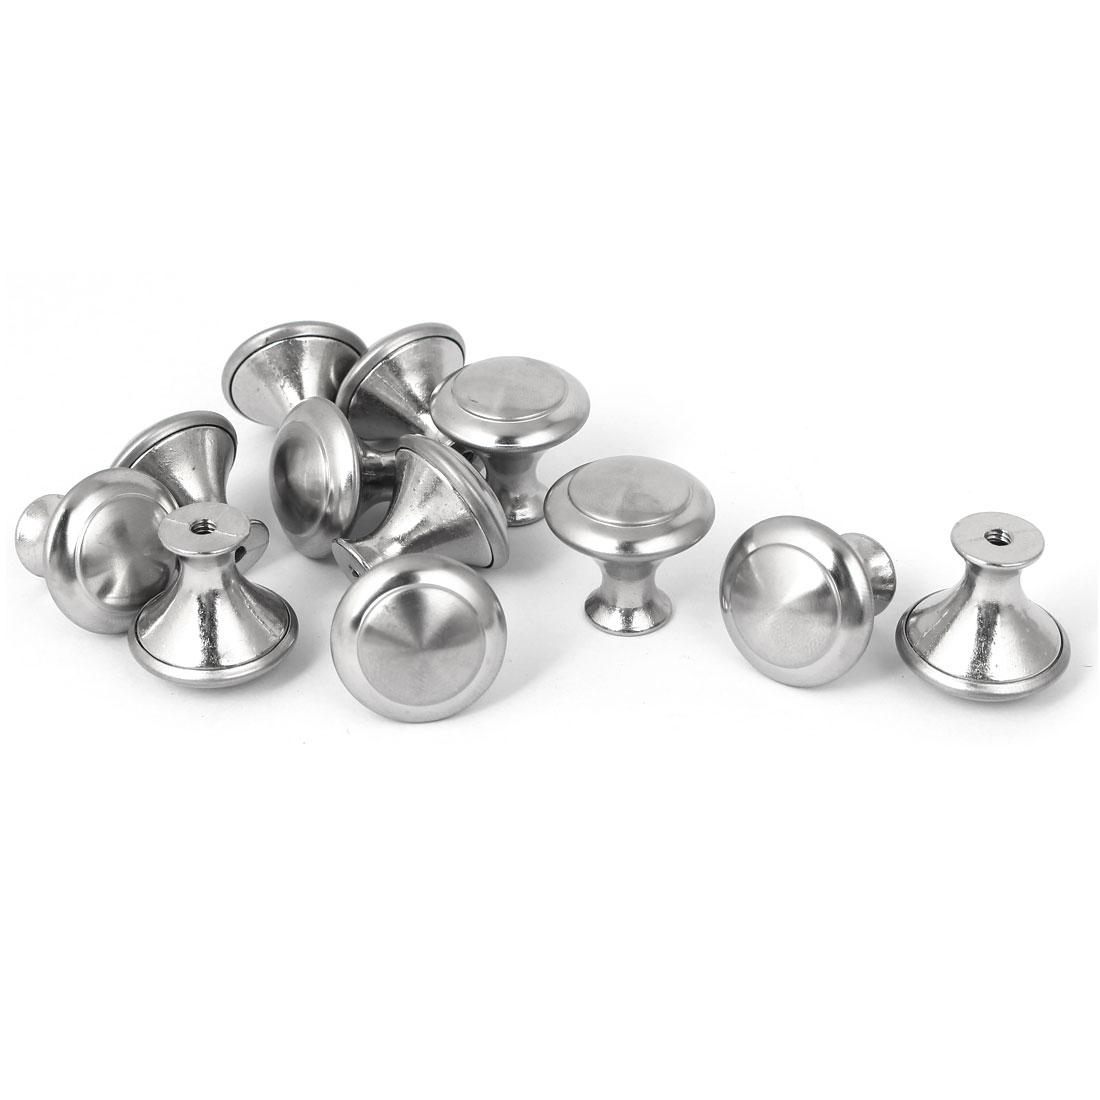 23mm x 22mm Zinc Alloy Single Hole Drawer Kitchen Knob Pull Handles 12PCS